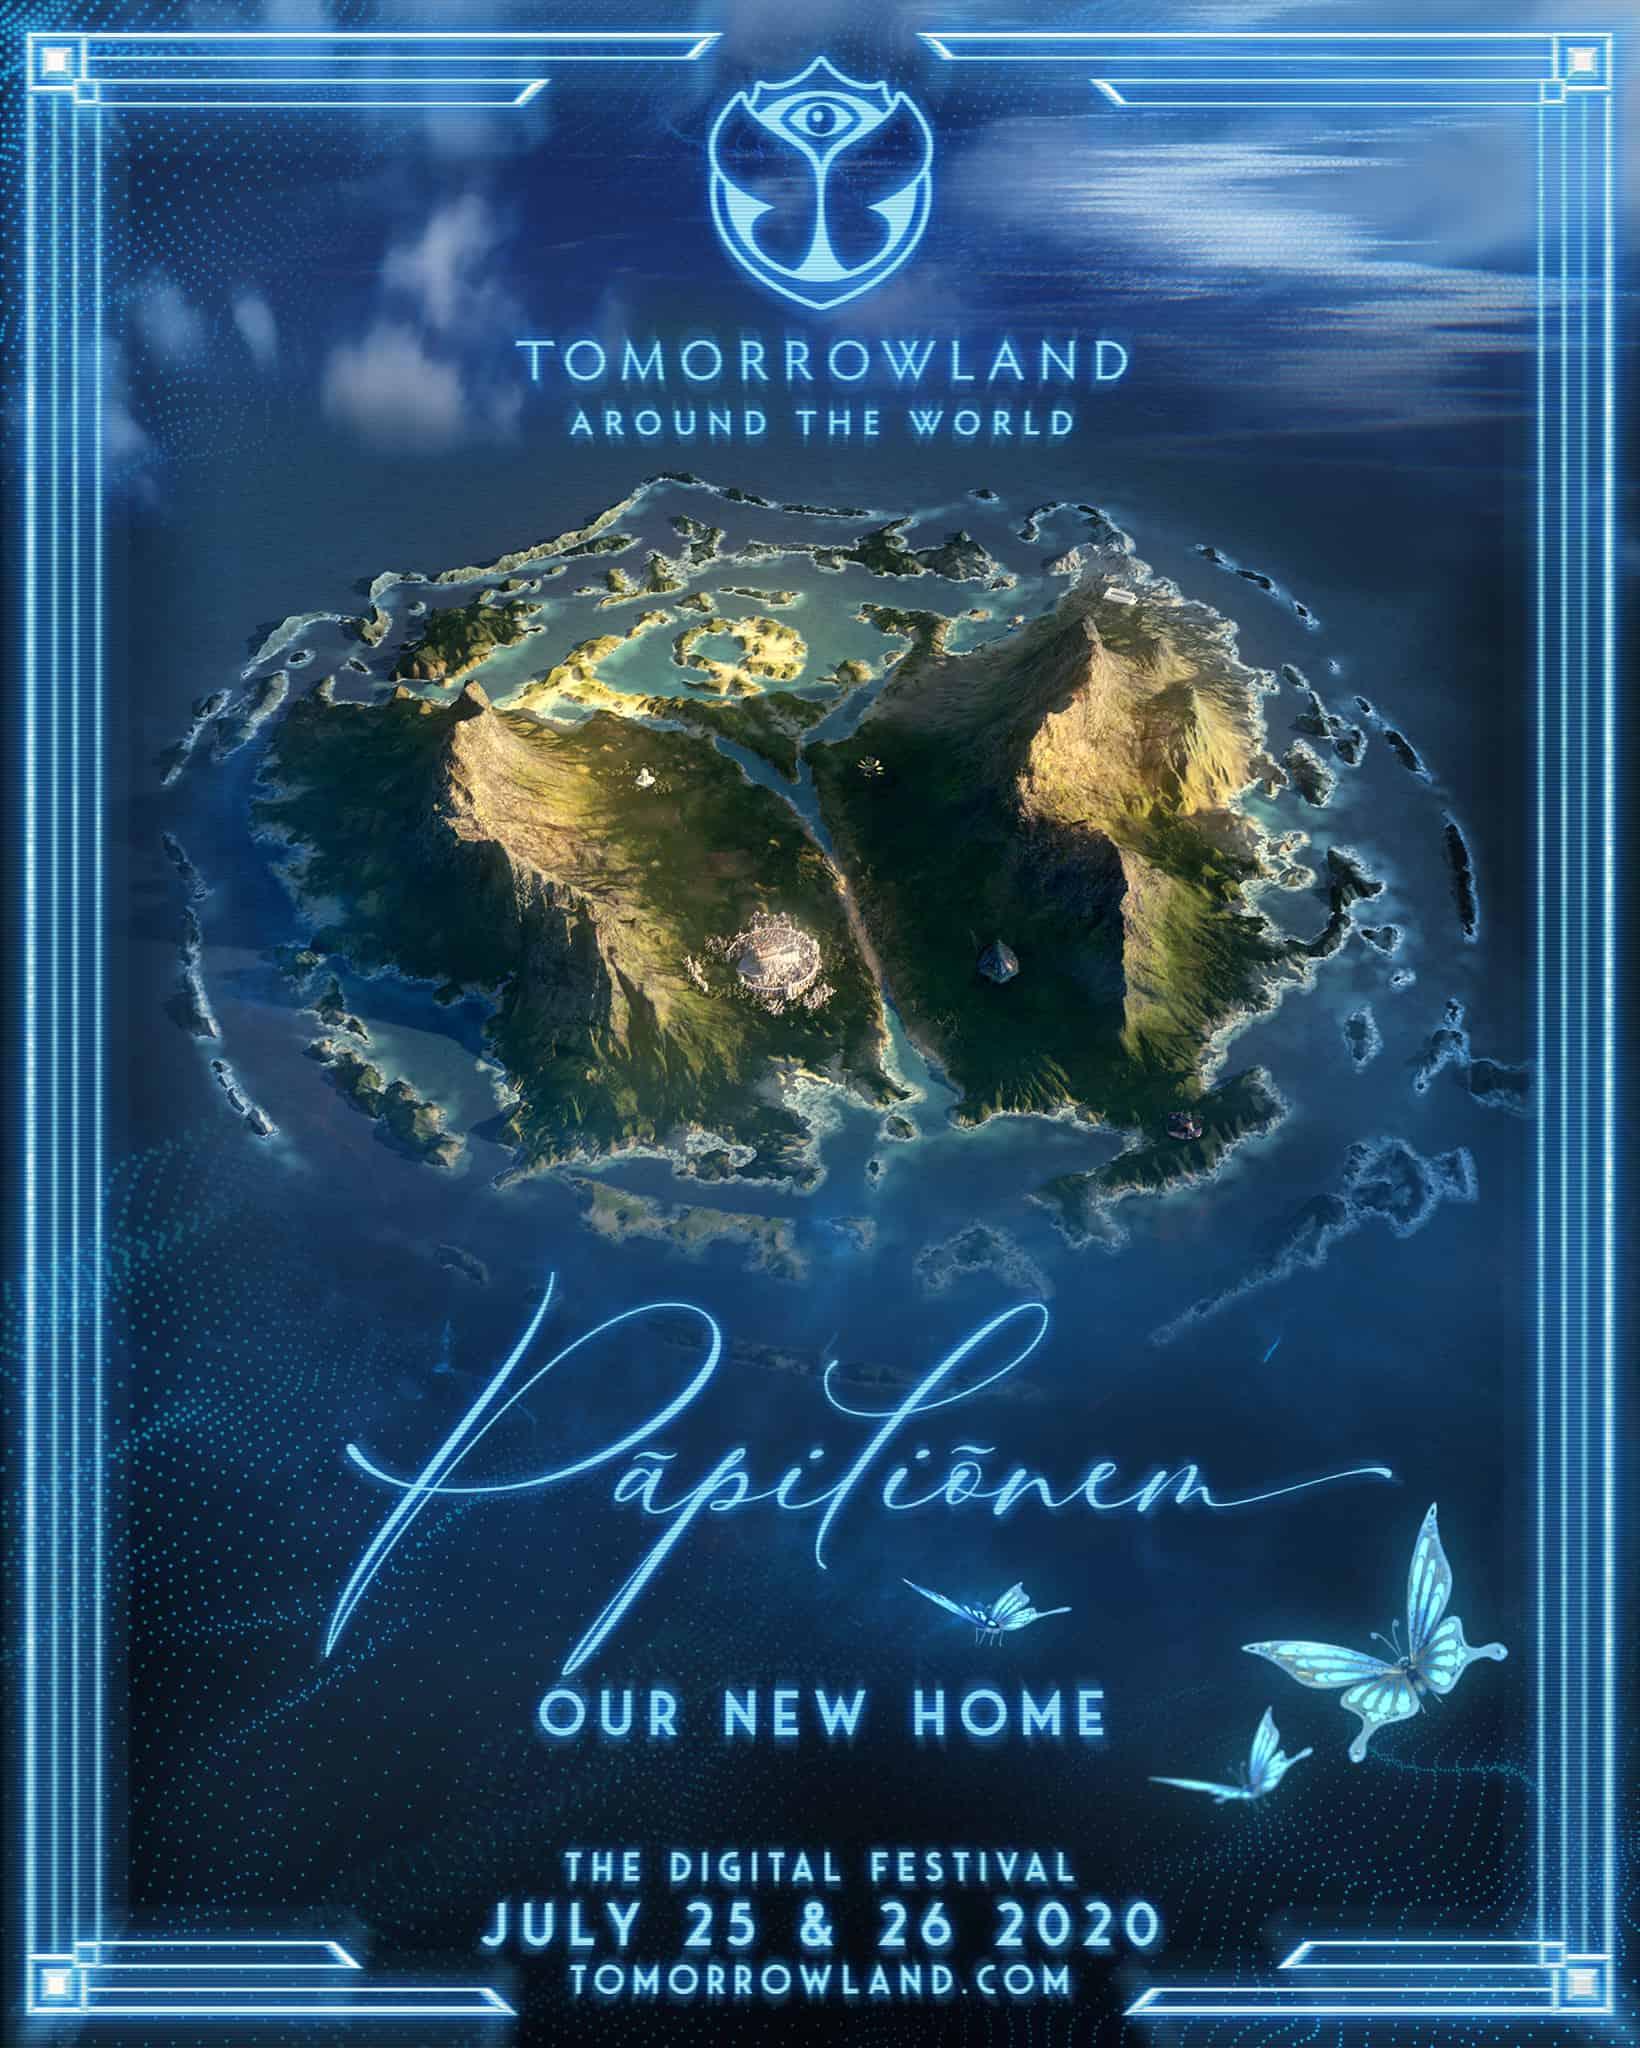 Tomorrowland Around the World - Pāpiliōnem - Announcement 1